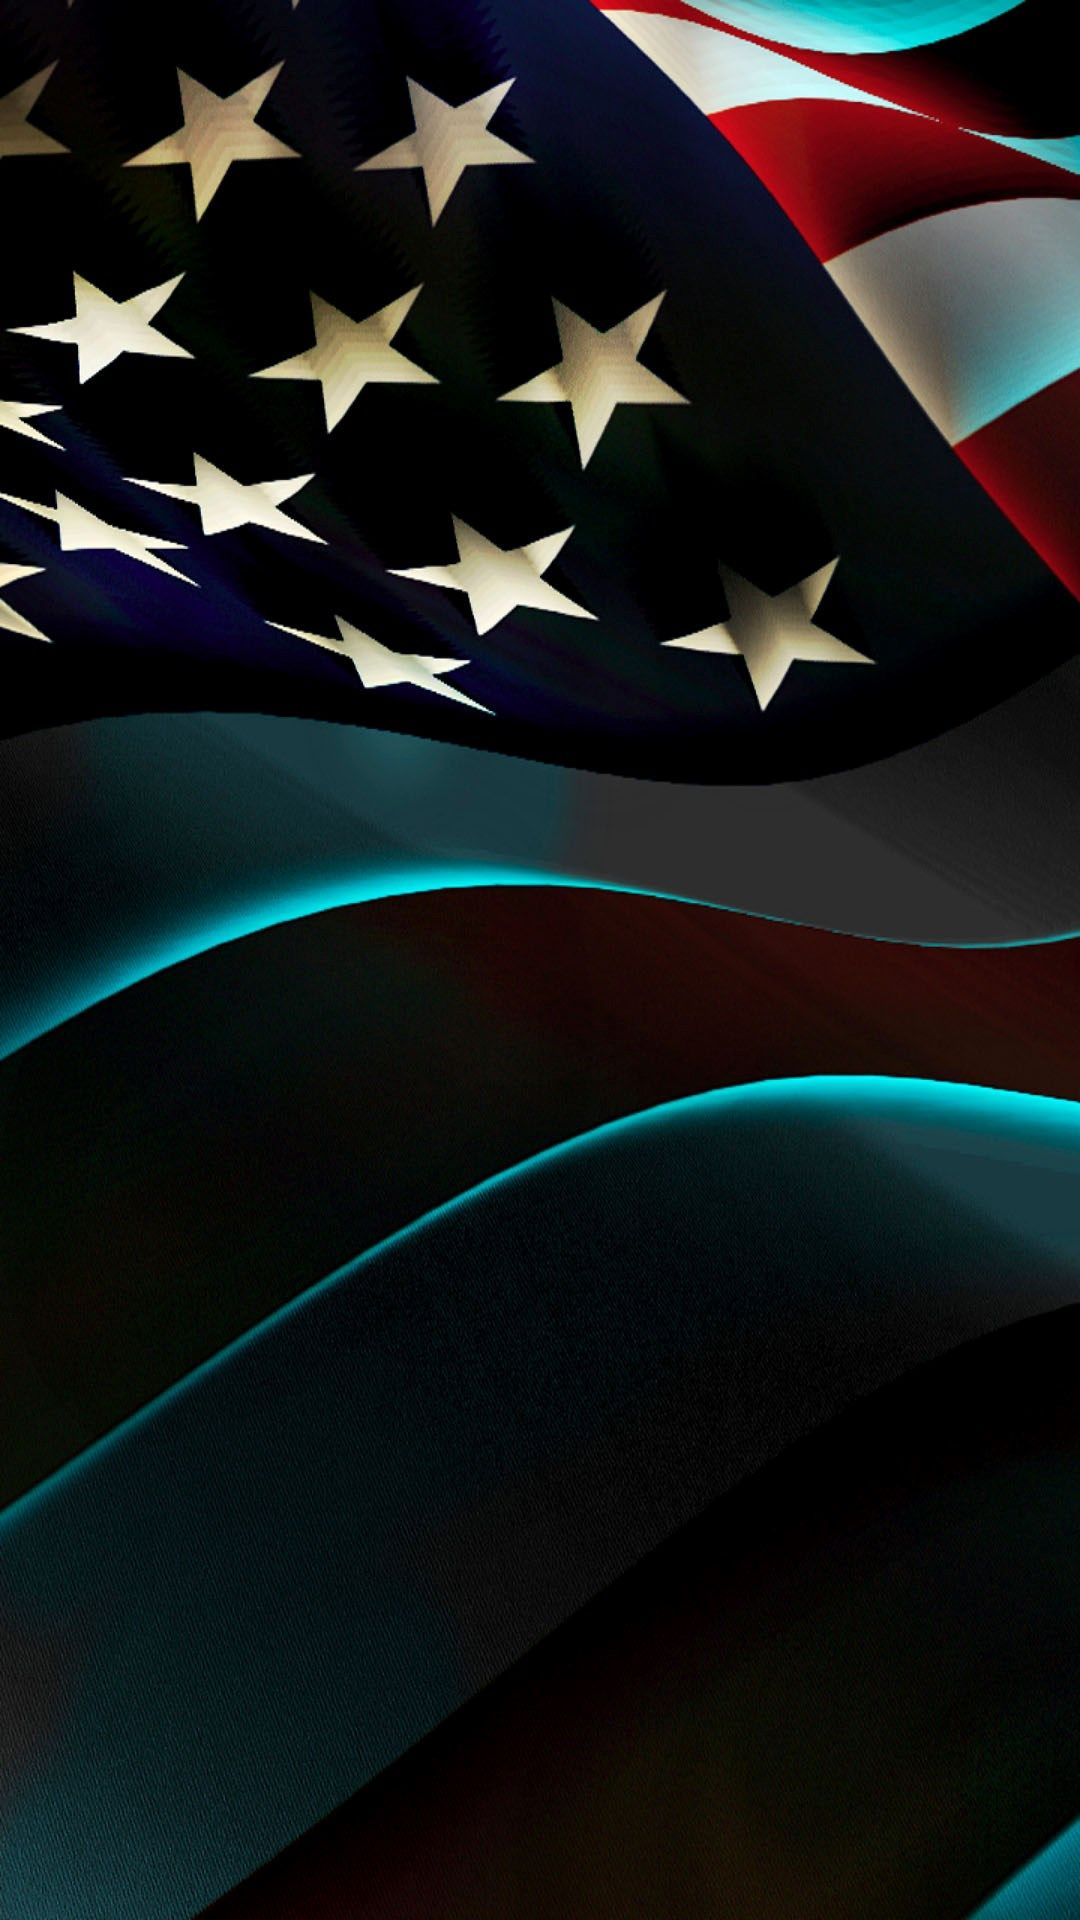 1080x1920 american flag iphone wallpaper Iphone